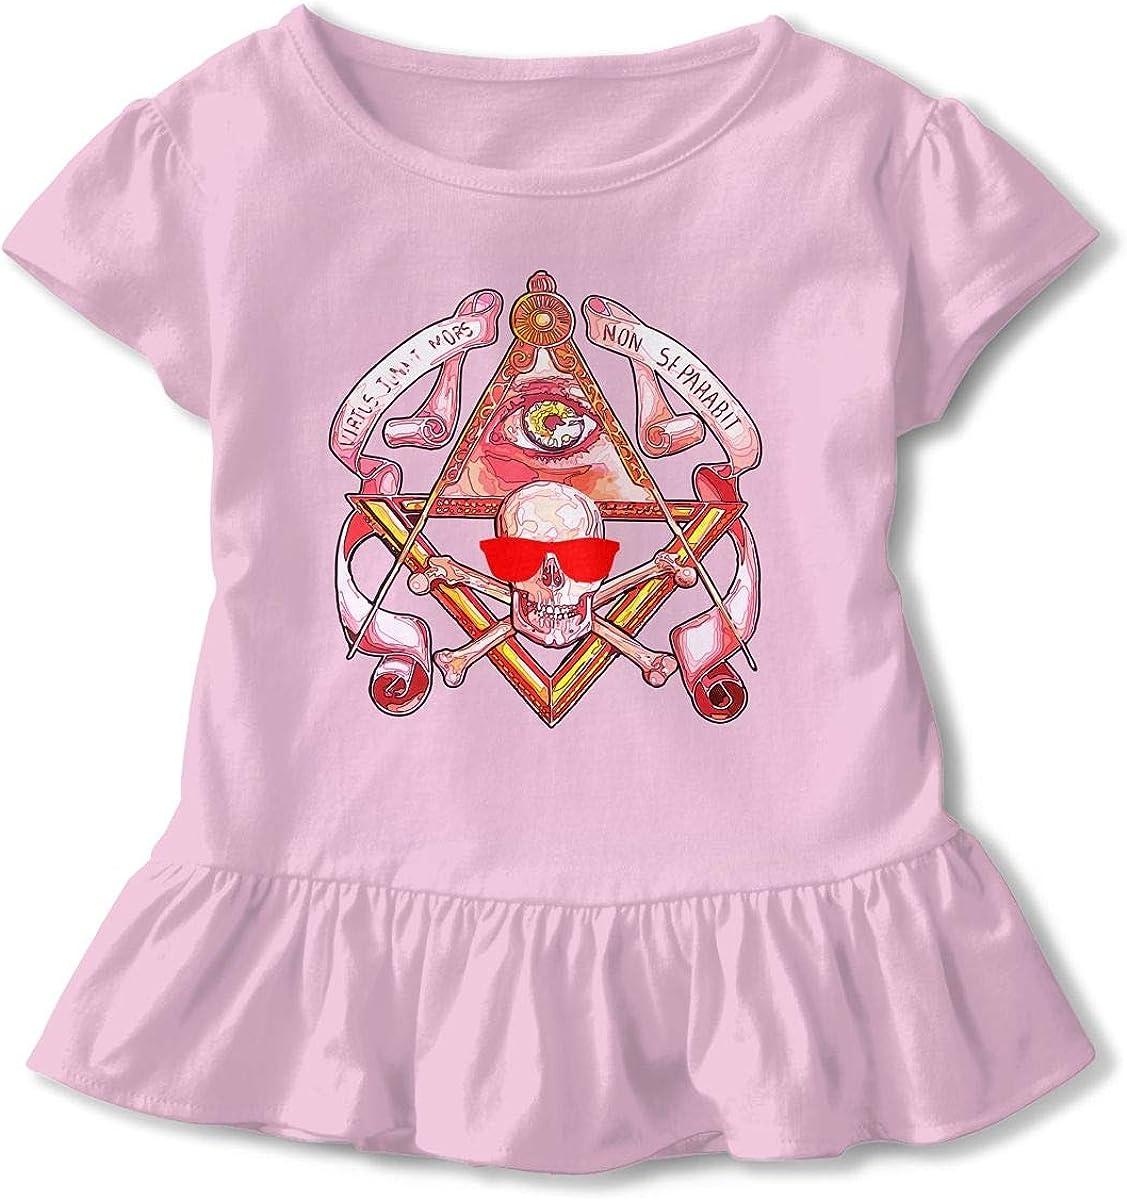 Cheng Jian Bo Skull Masonic Eyes of Horus Toddler Girls T Shirt Kids Cotton Short Sleeve Ruffle Tee